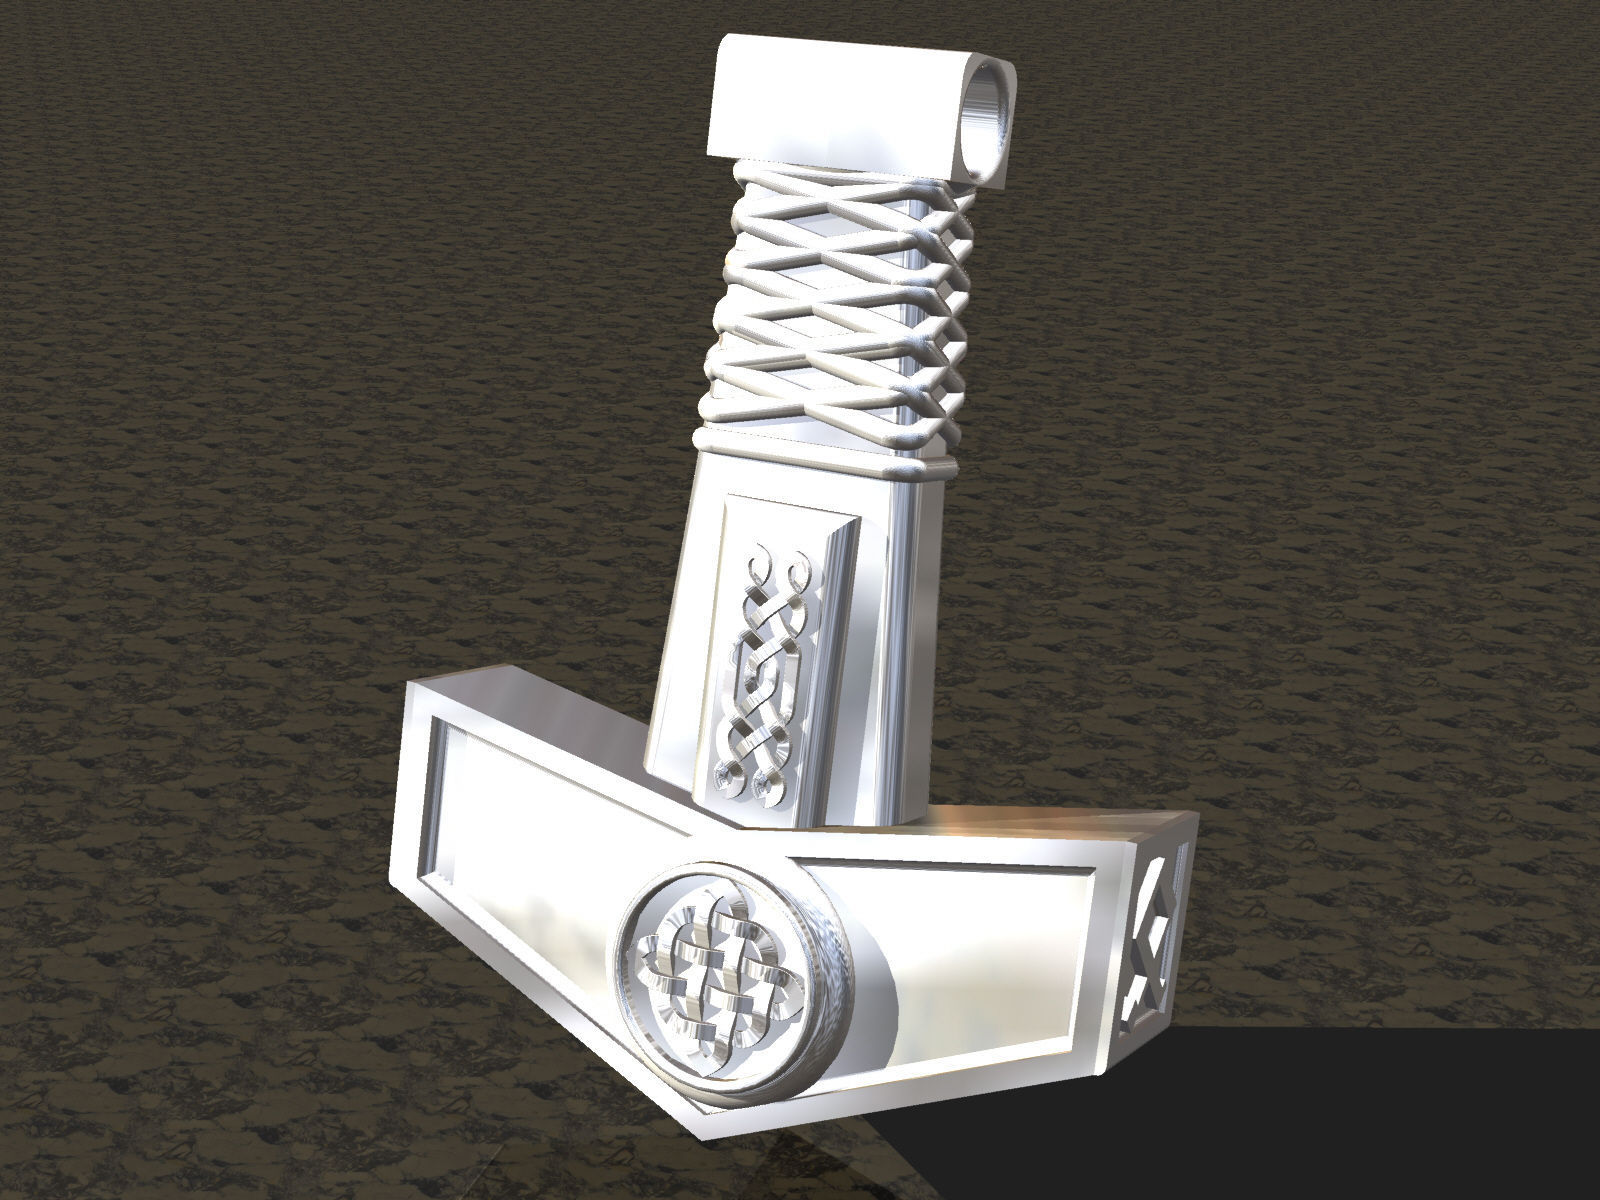 Pendant thor hammer 3d print model cgtrader pendant thor hammer 3d model obj 3ds stl 3dm 2 mozeypictures Gallery